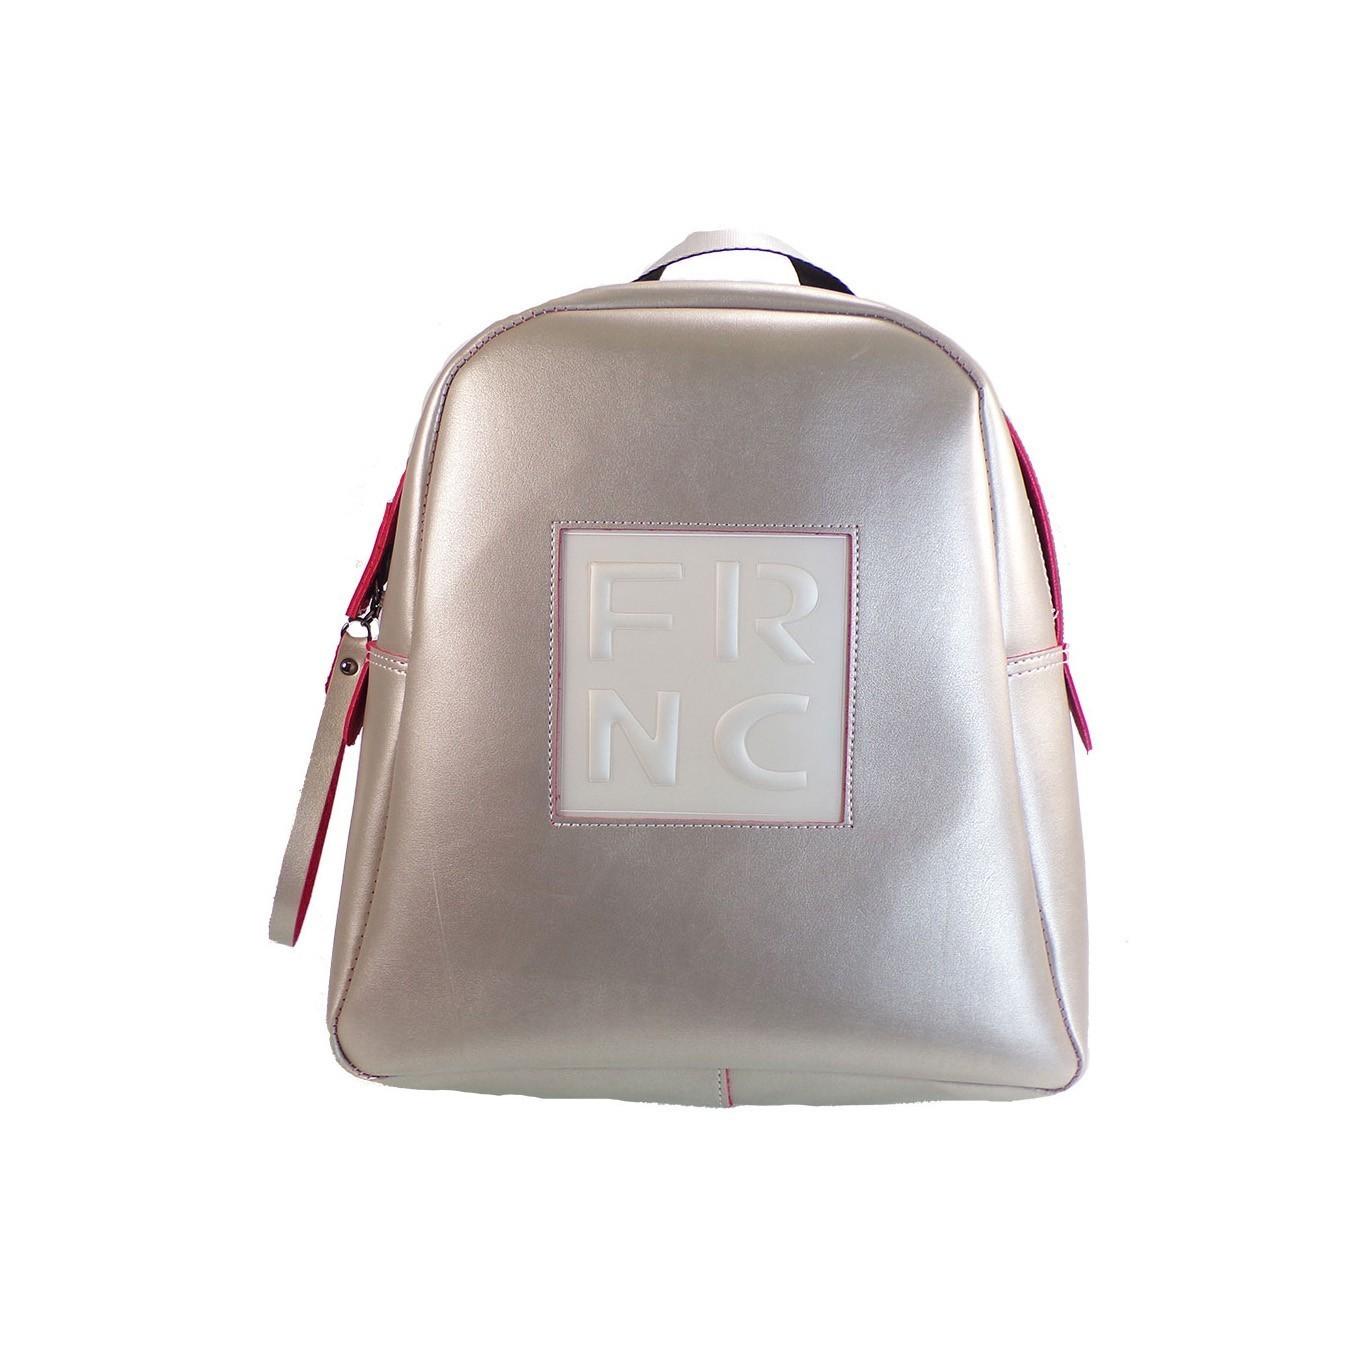 e36b0b4668 FRNC FRANCESCO Τσάντα Γυναικεία Πλάτης-Backpack 1201 Πλατίνα Δέρμα ...